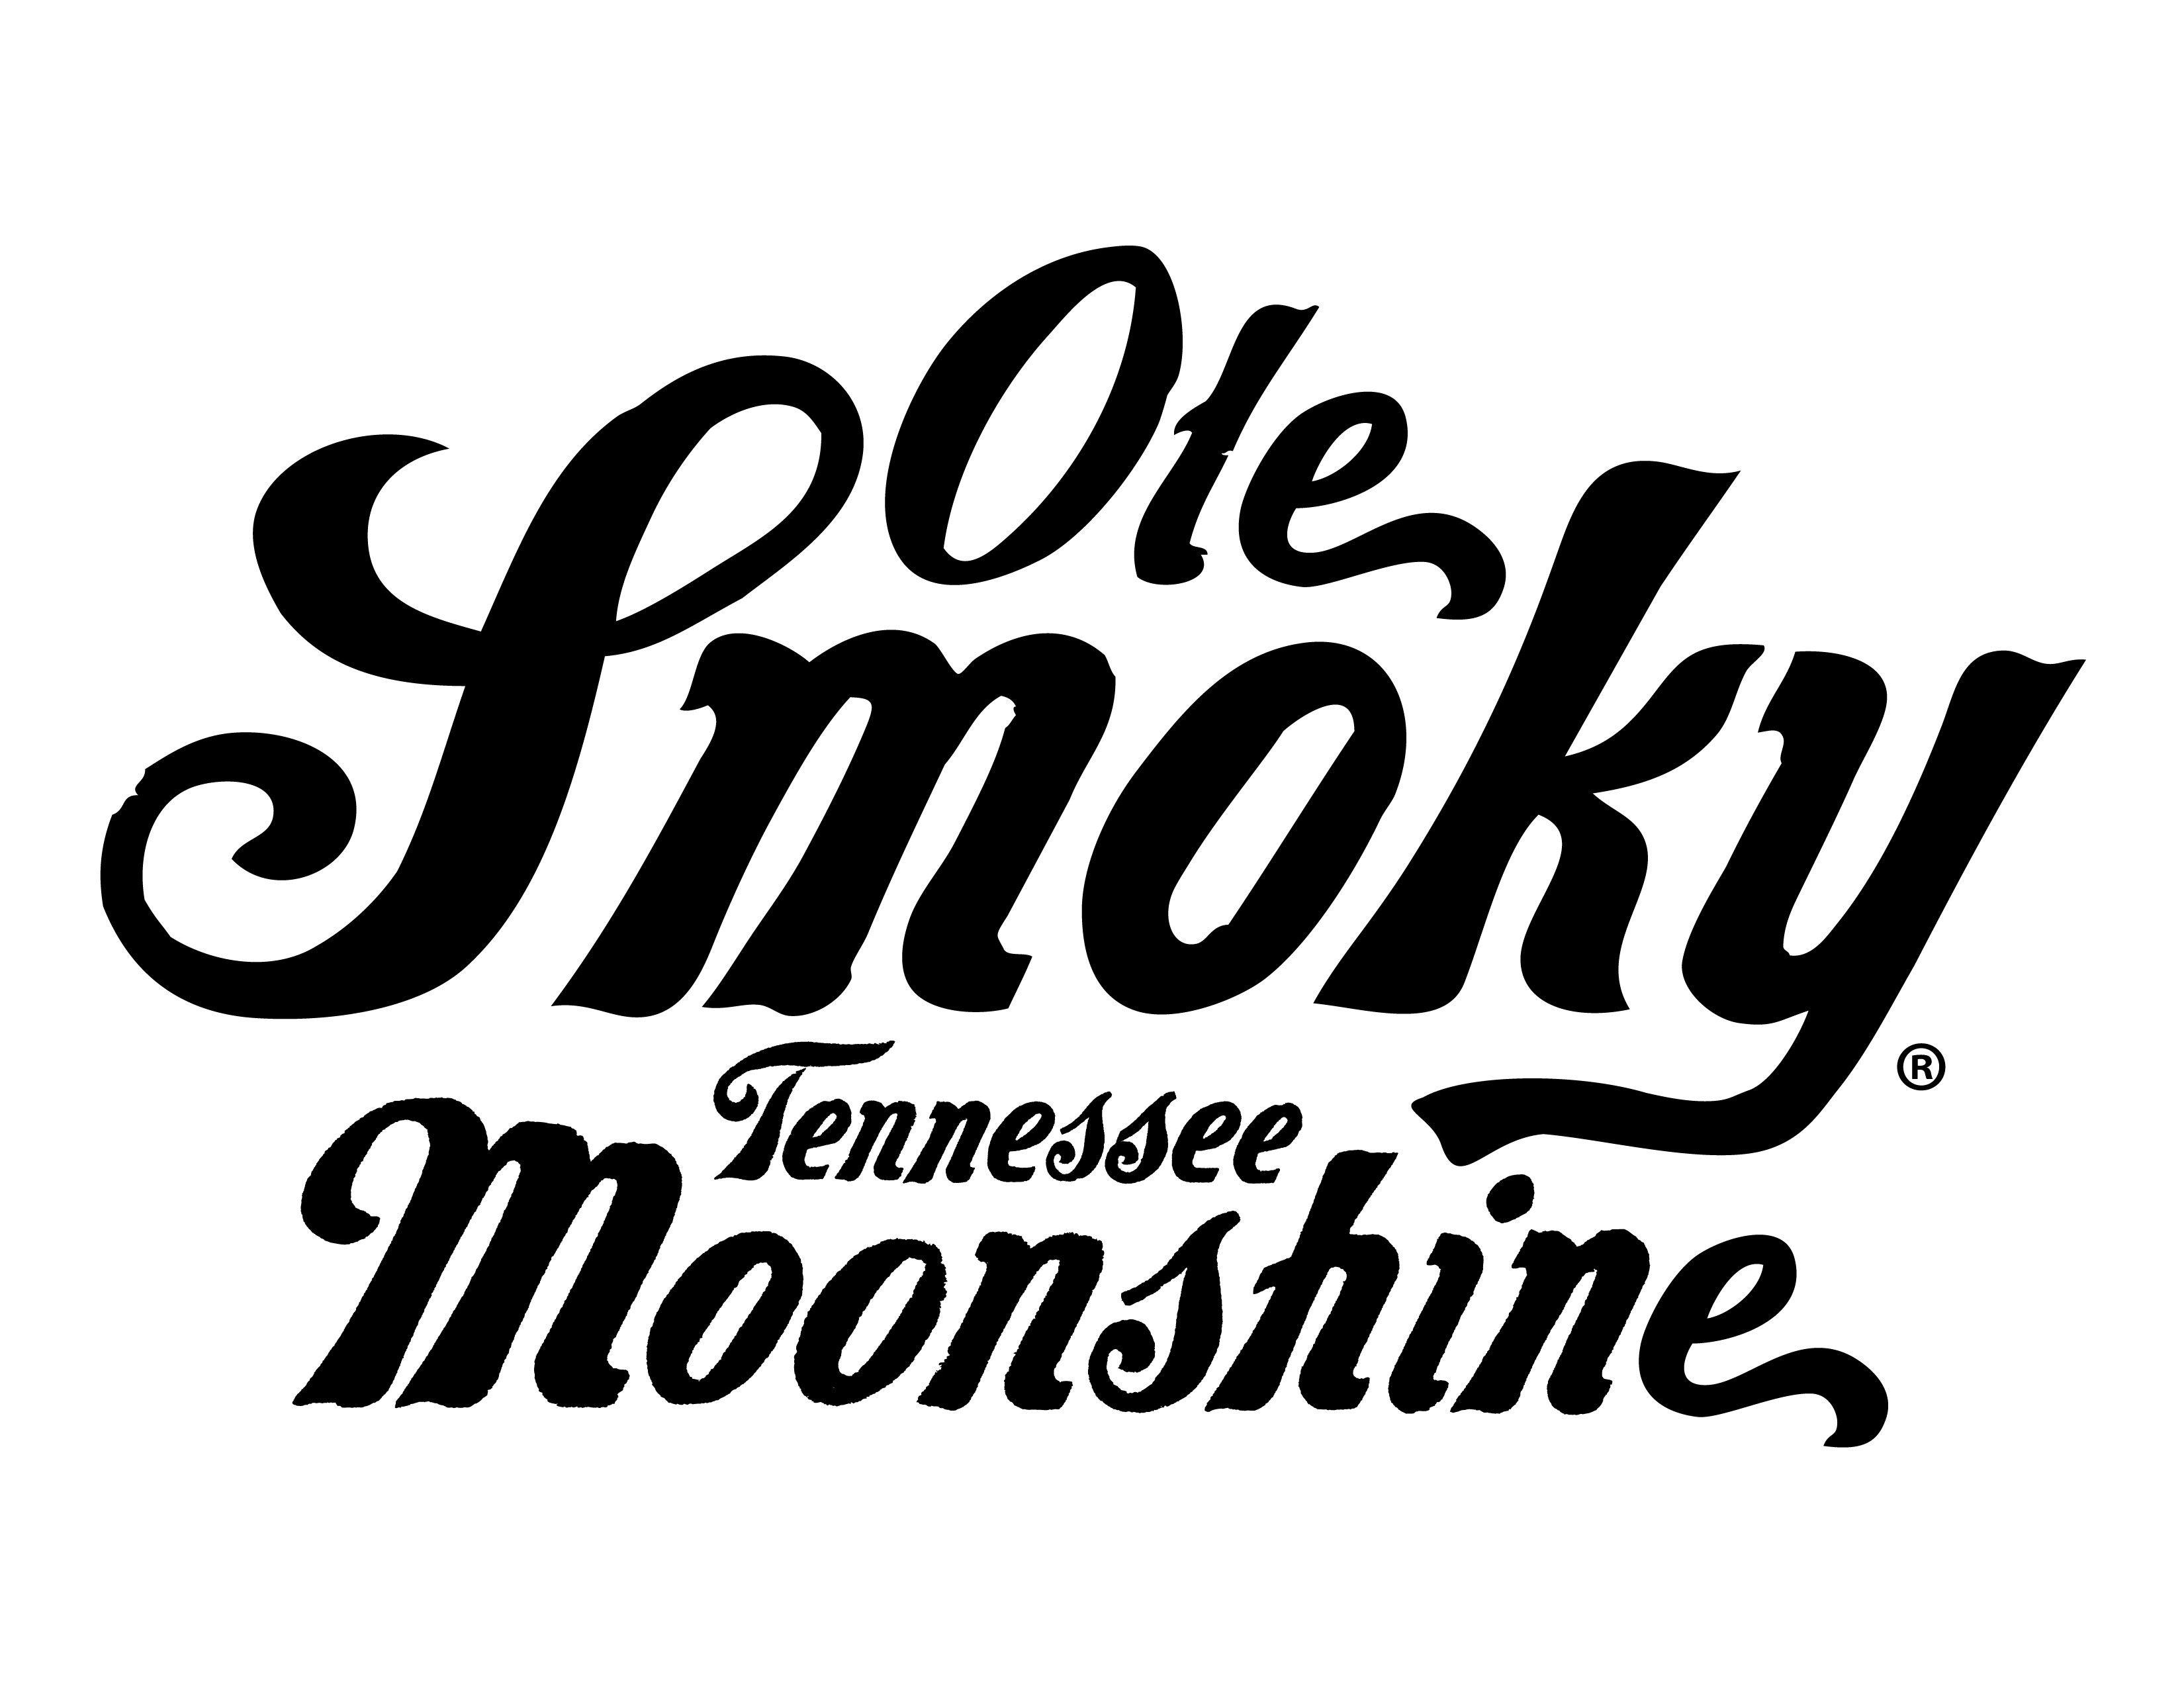 "5/"" OLE SMOKY TENNESSEE MOONSHINE STICKER GATLINBURG DECAL SHINE NASHVILLE SHINE"